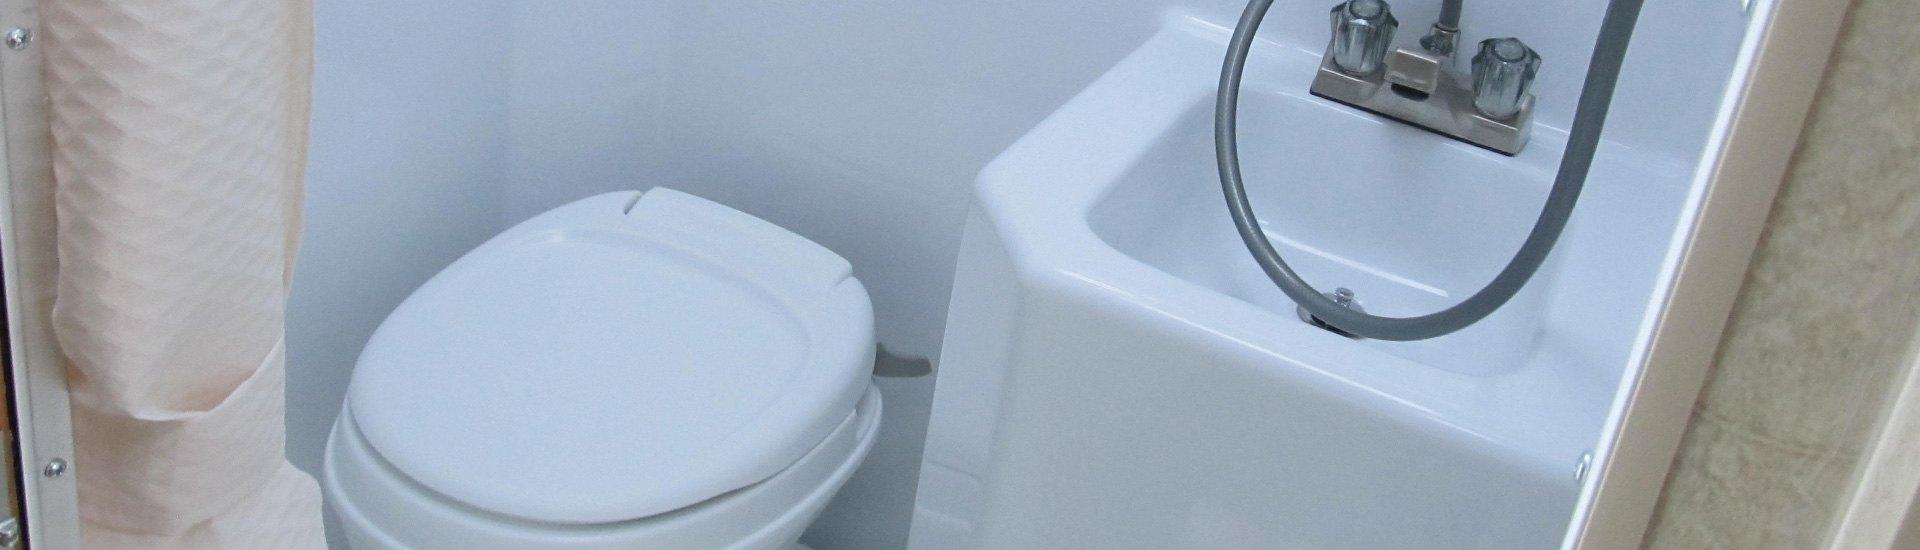 RV Bathroom | Sinks, Bathtubs, Faucets, Accessories